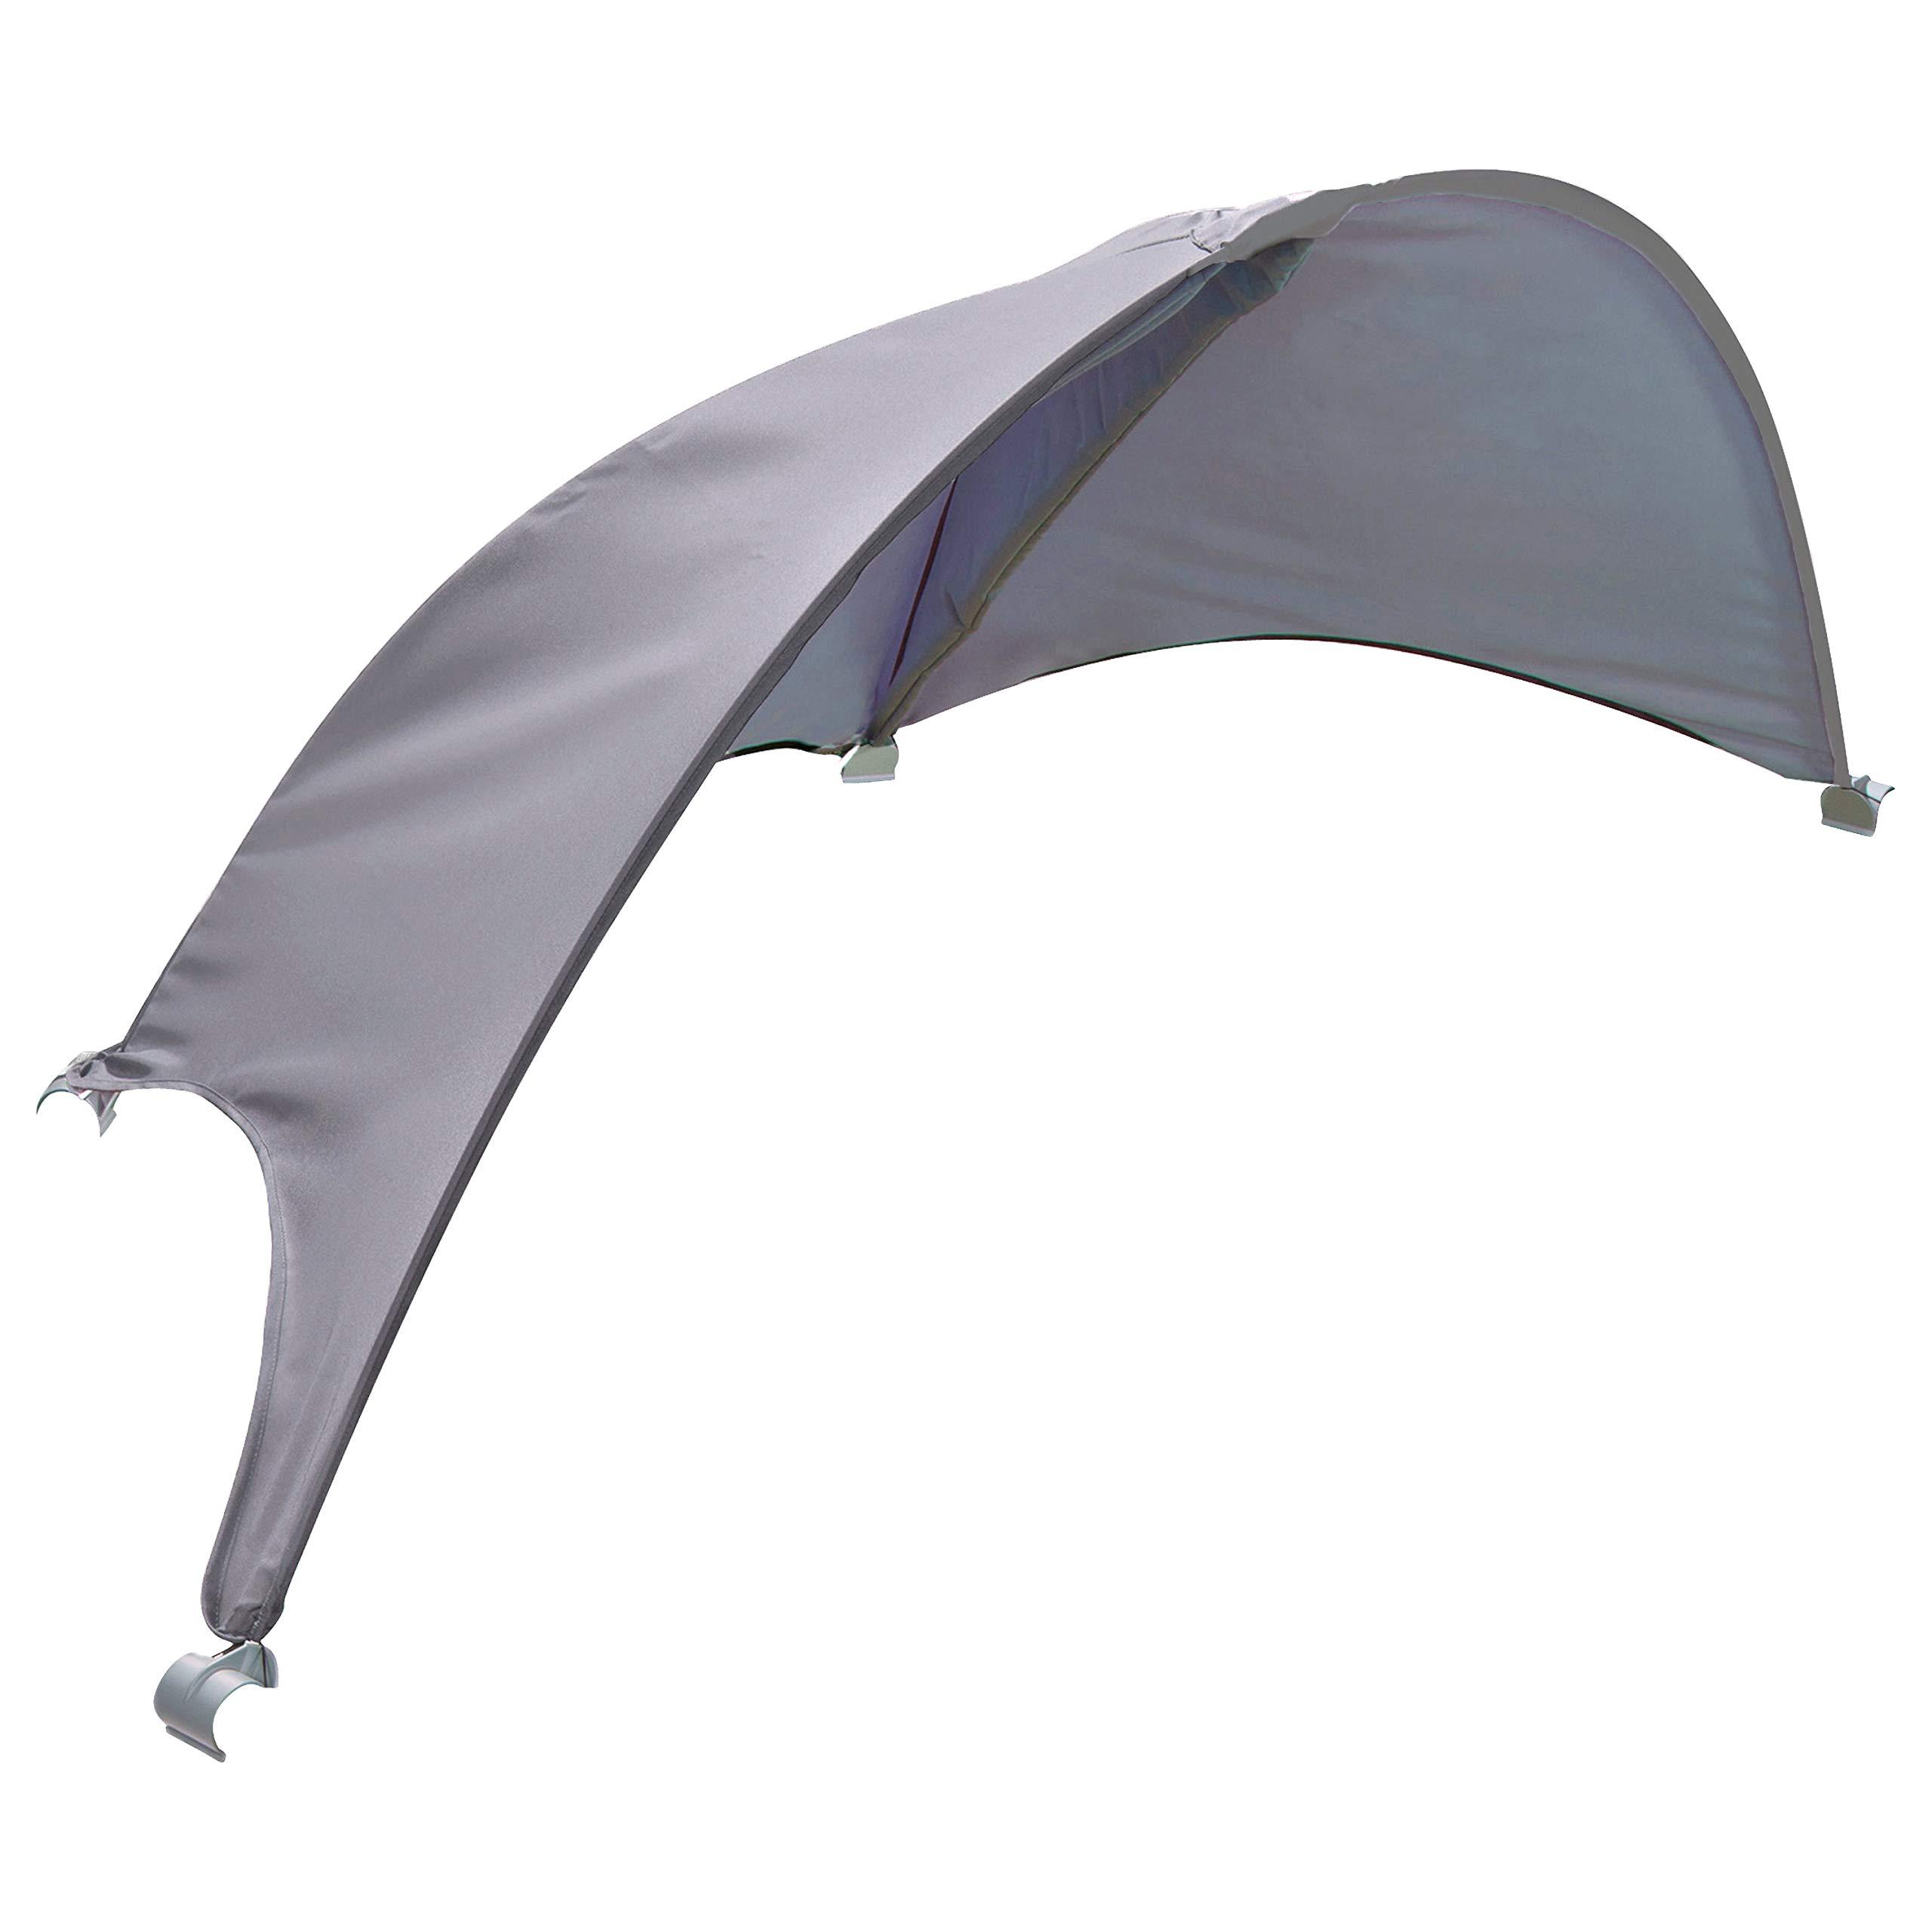 Summer Infant Pop N' Play Portable Playard Canopy